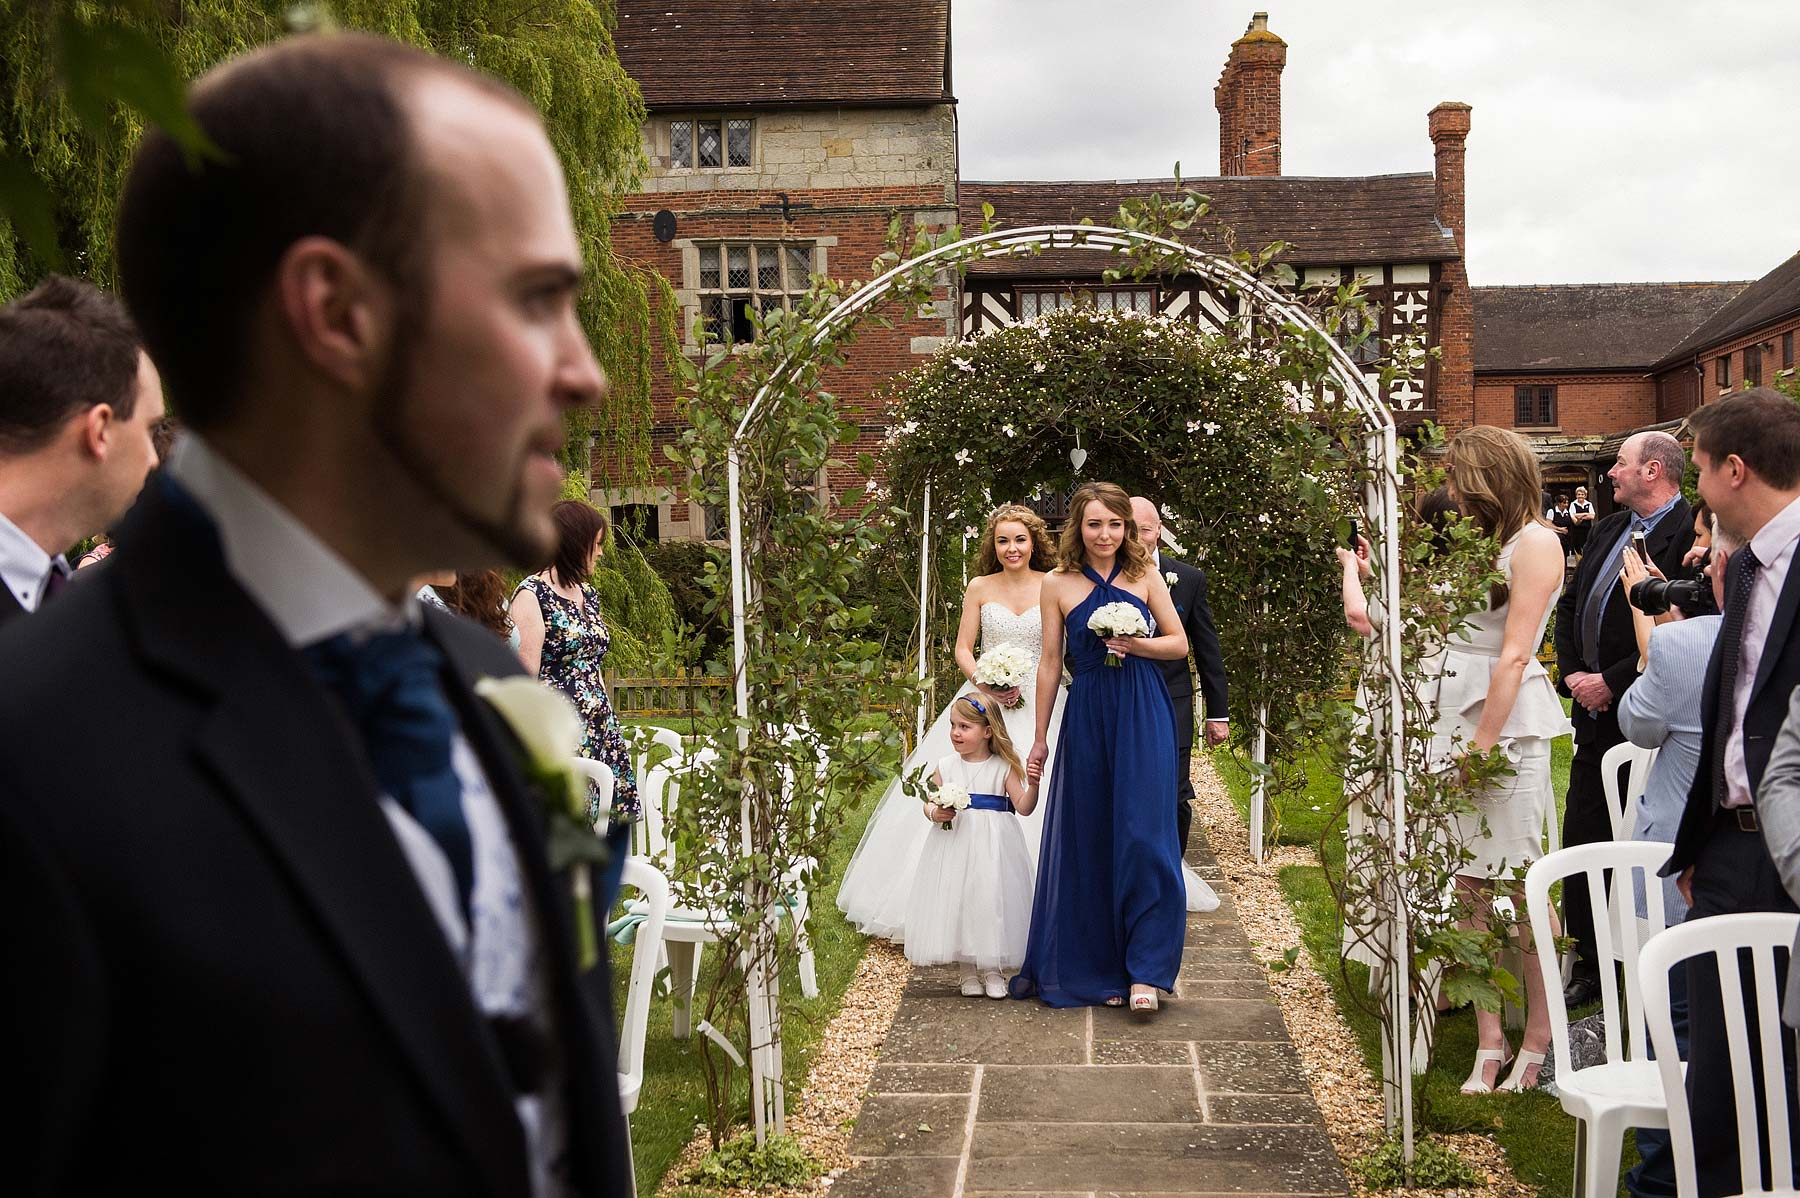 albright-hussey-manor-wedding-photographers-024